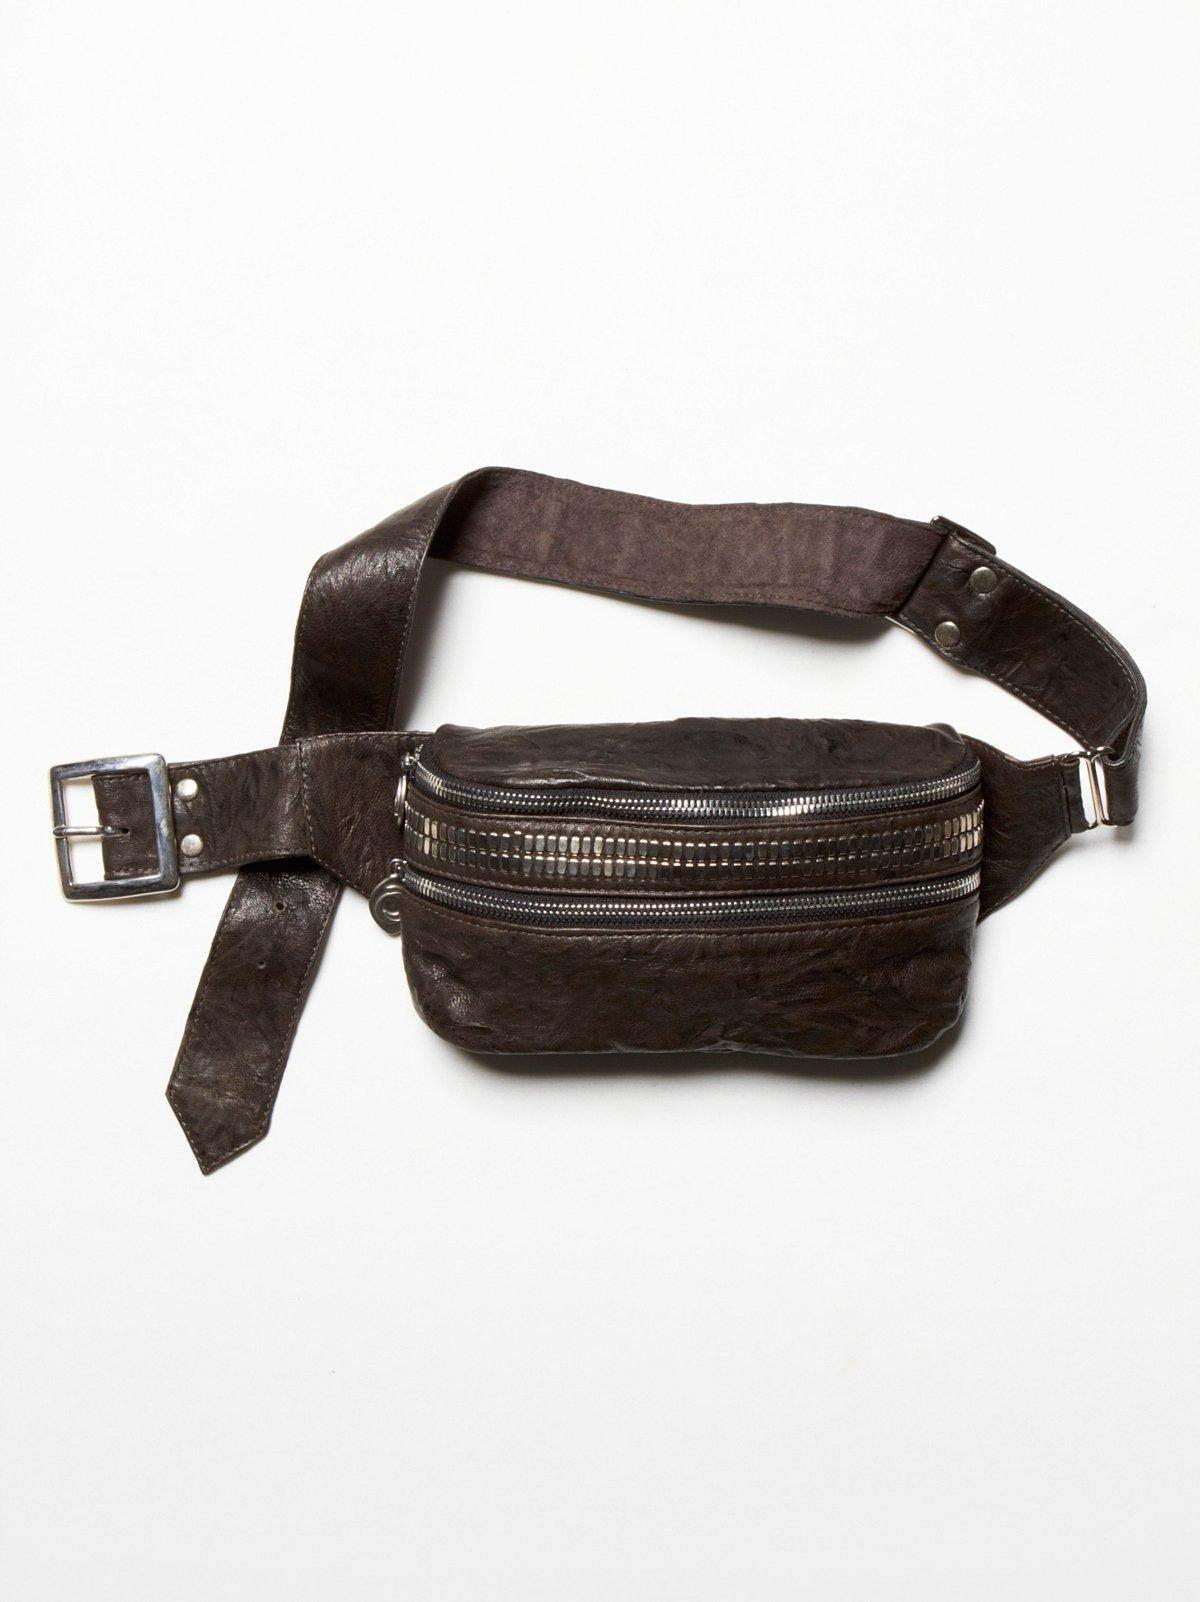 Palomar Pocket Belt